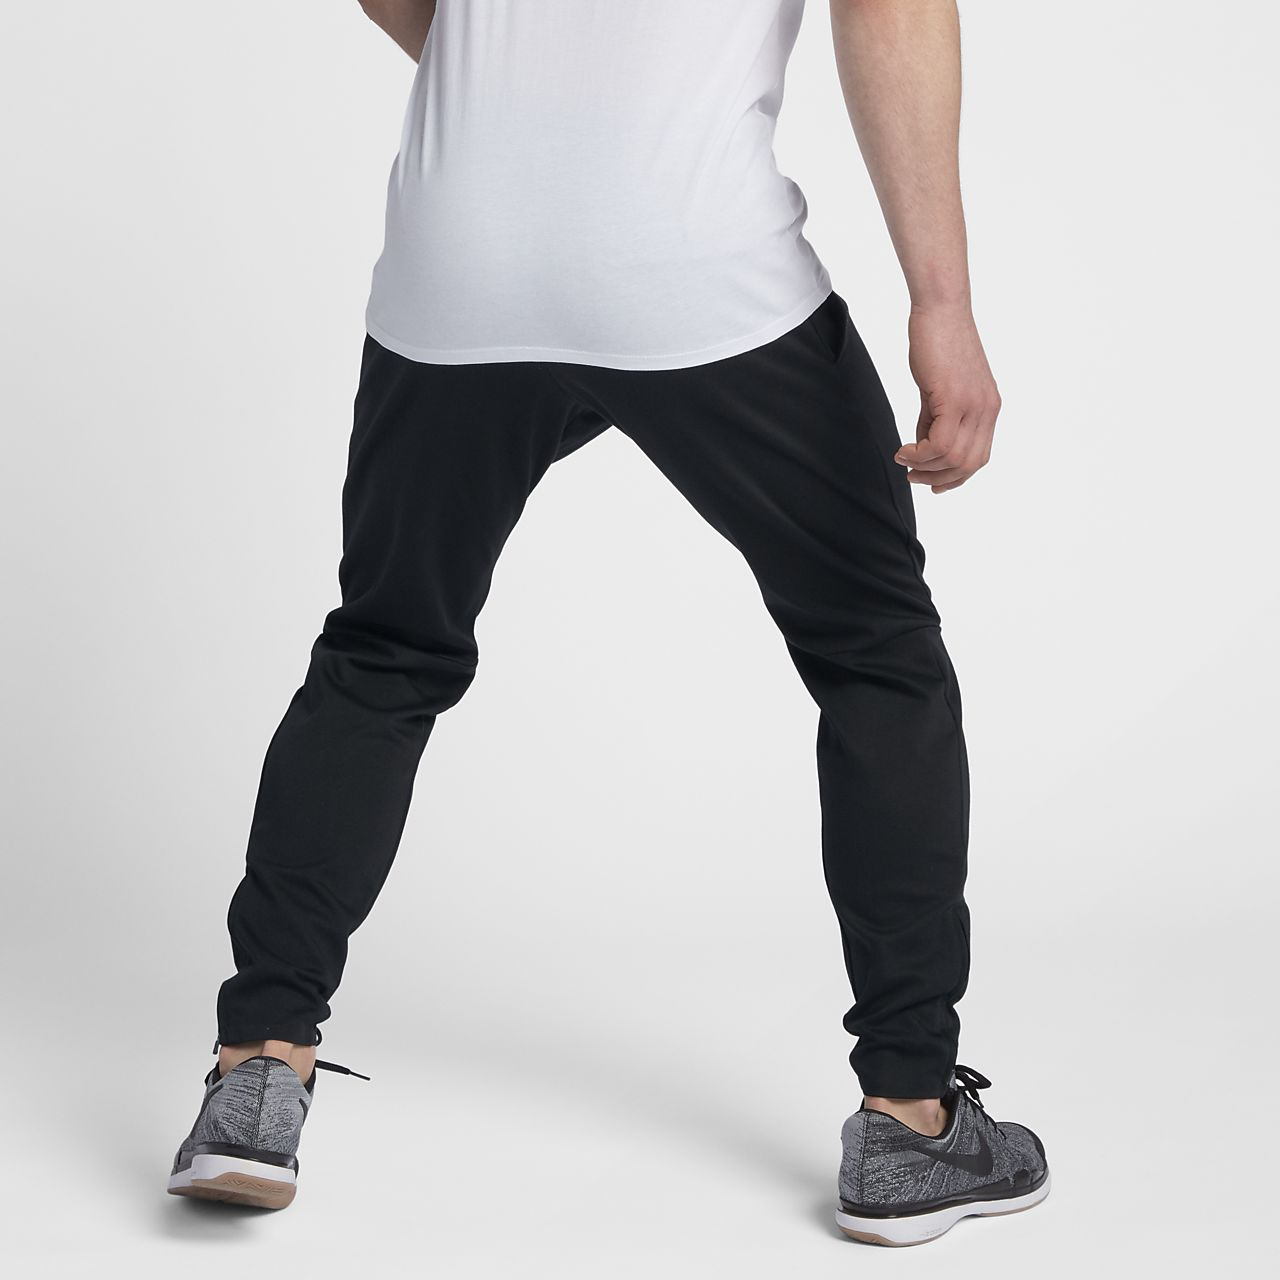 NikeCourt Men's Tennis Pants Black